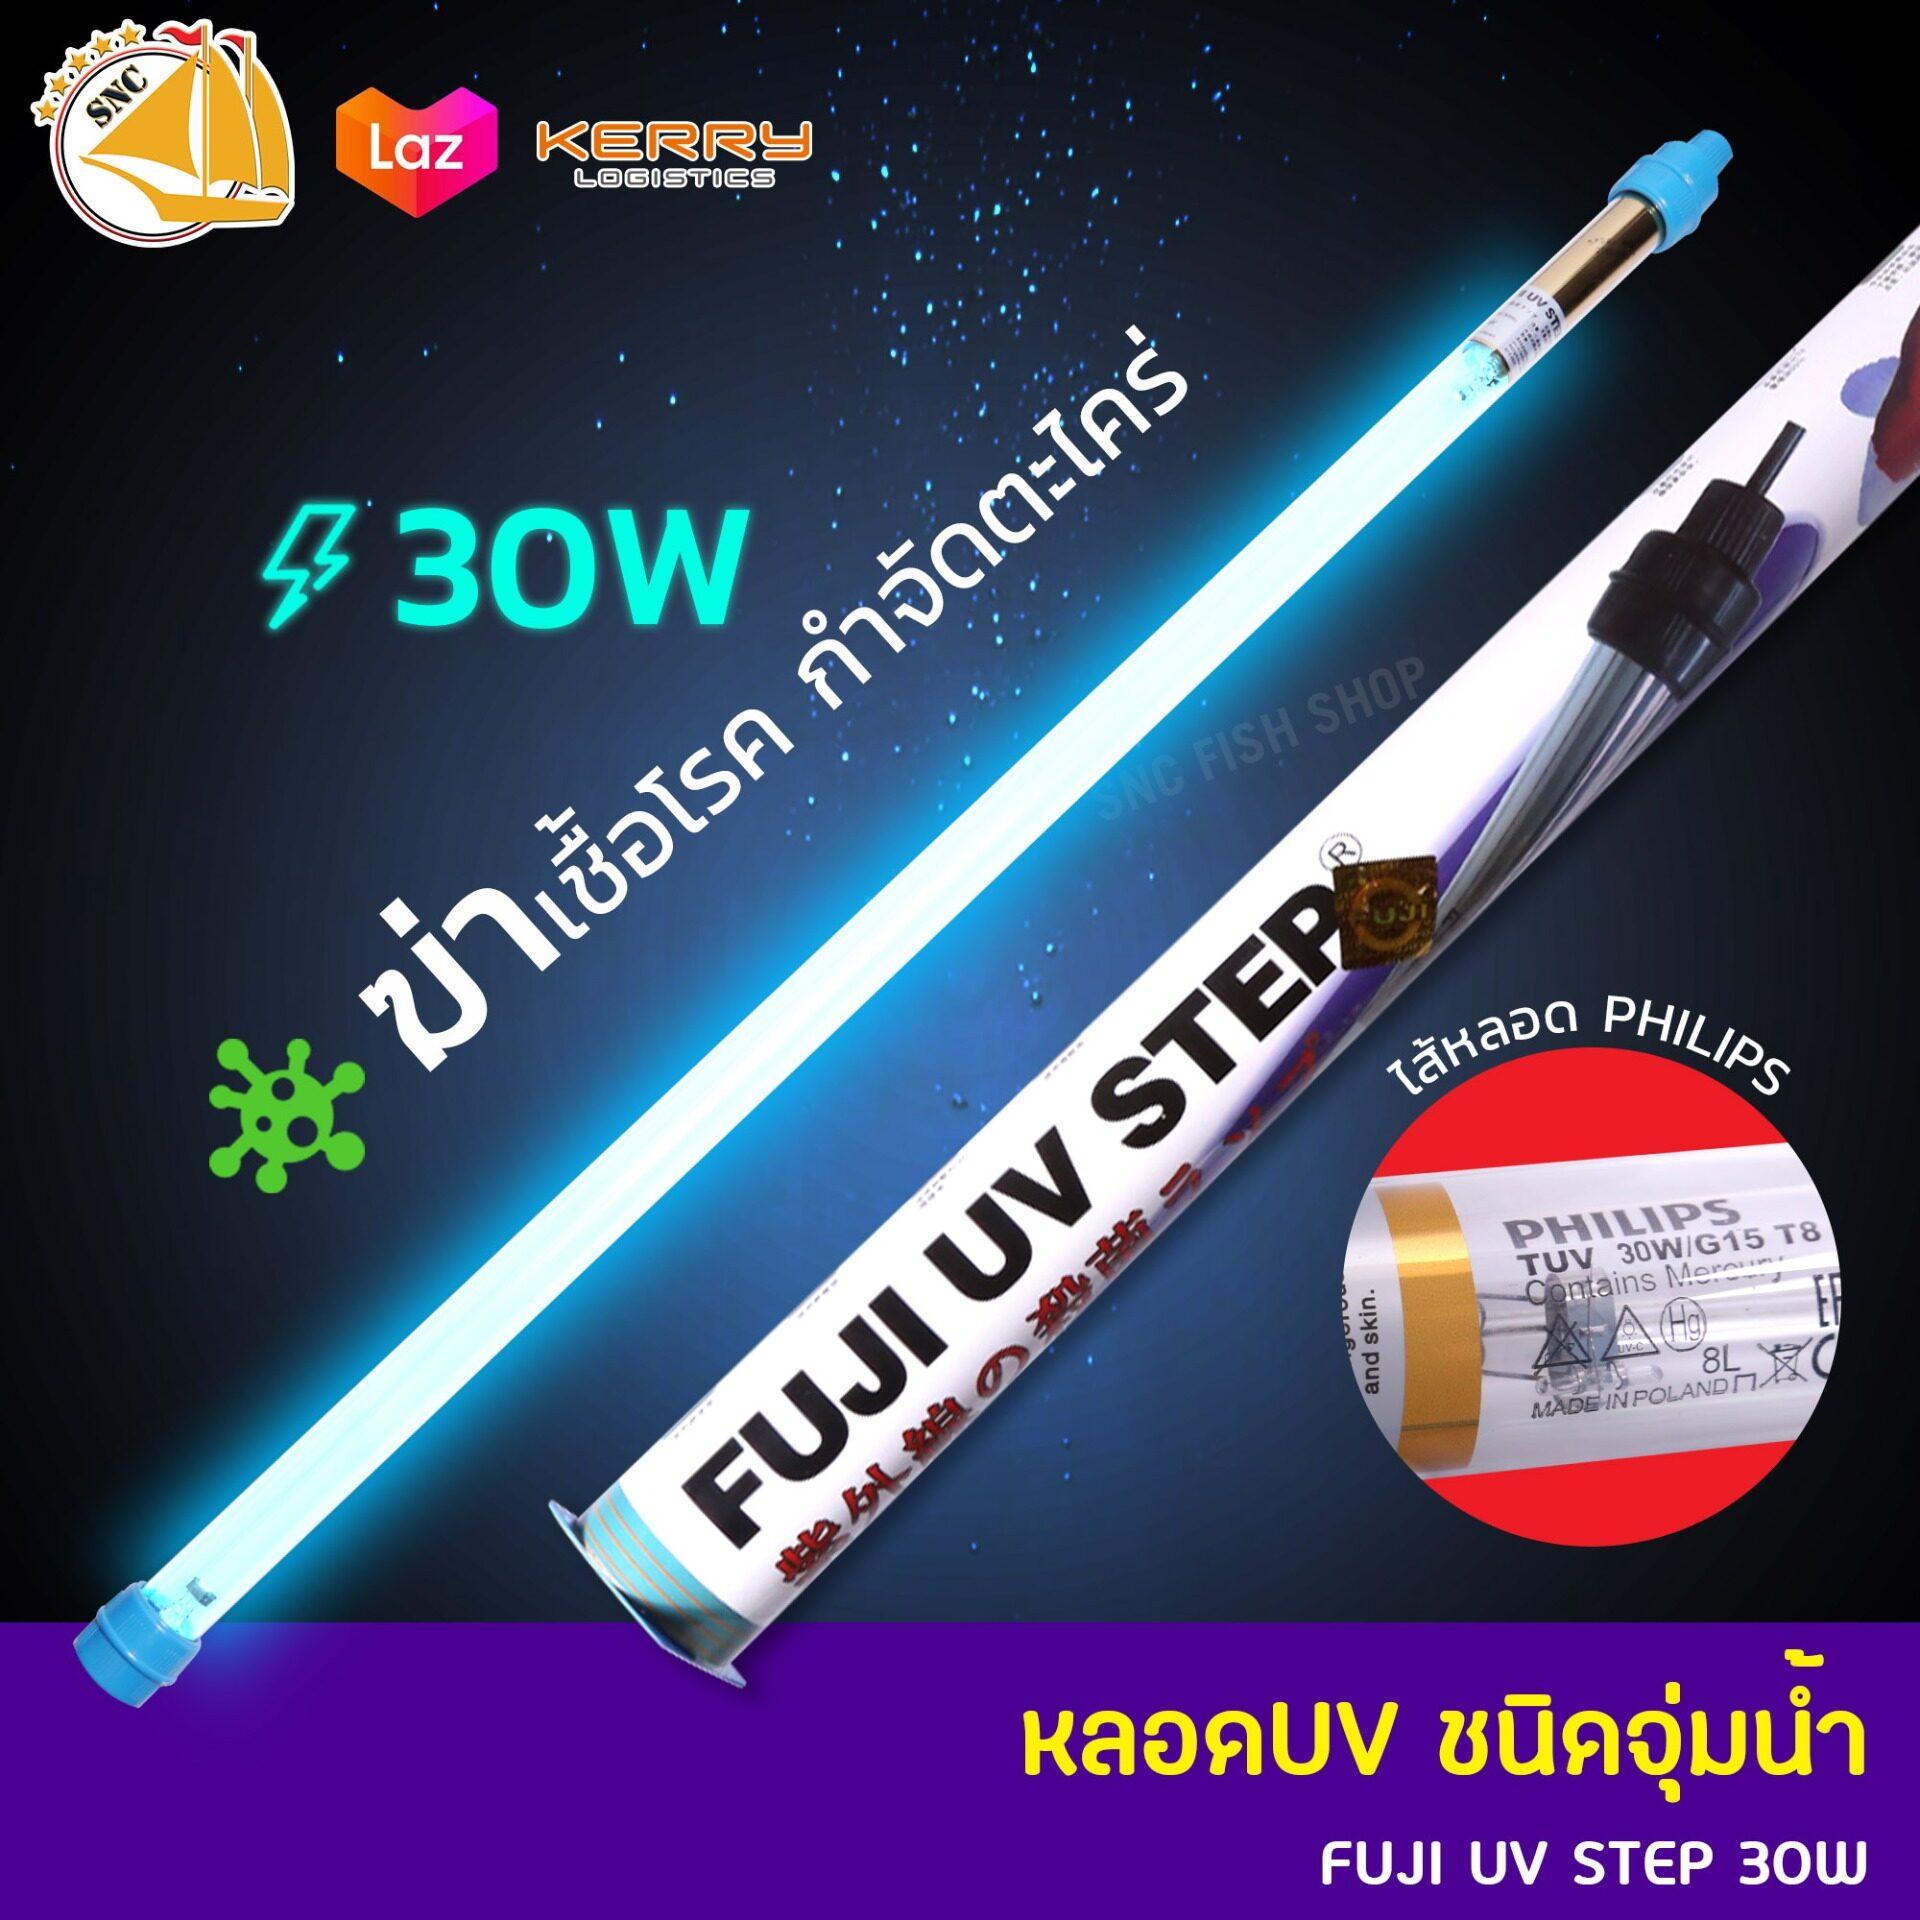 FUJI UV STEP 30W หลอด UV ชนิดจุ่มน้ำ ไส้หลอดPhilips